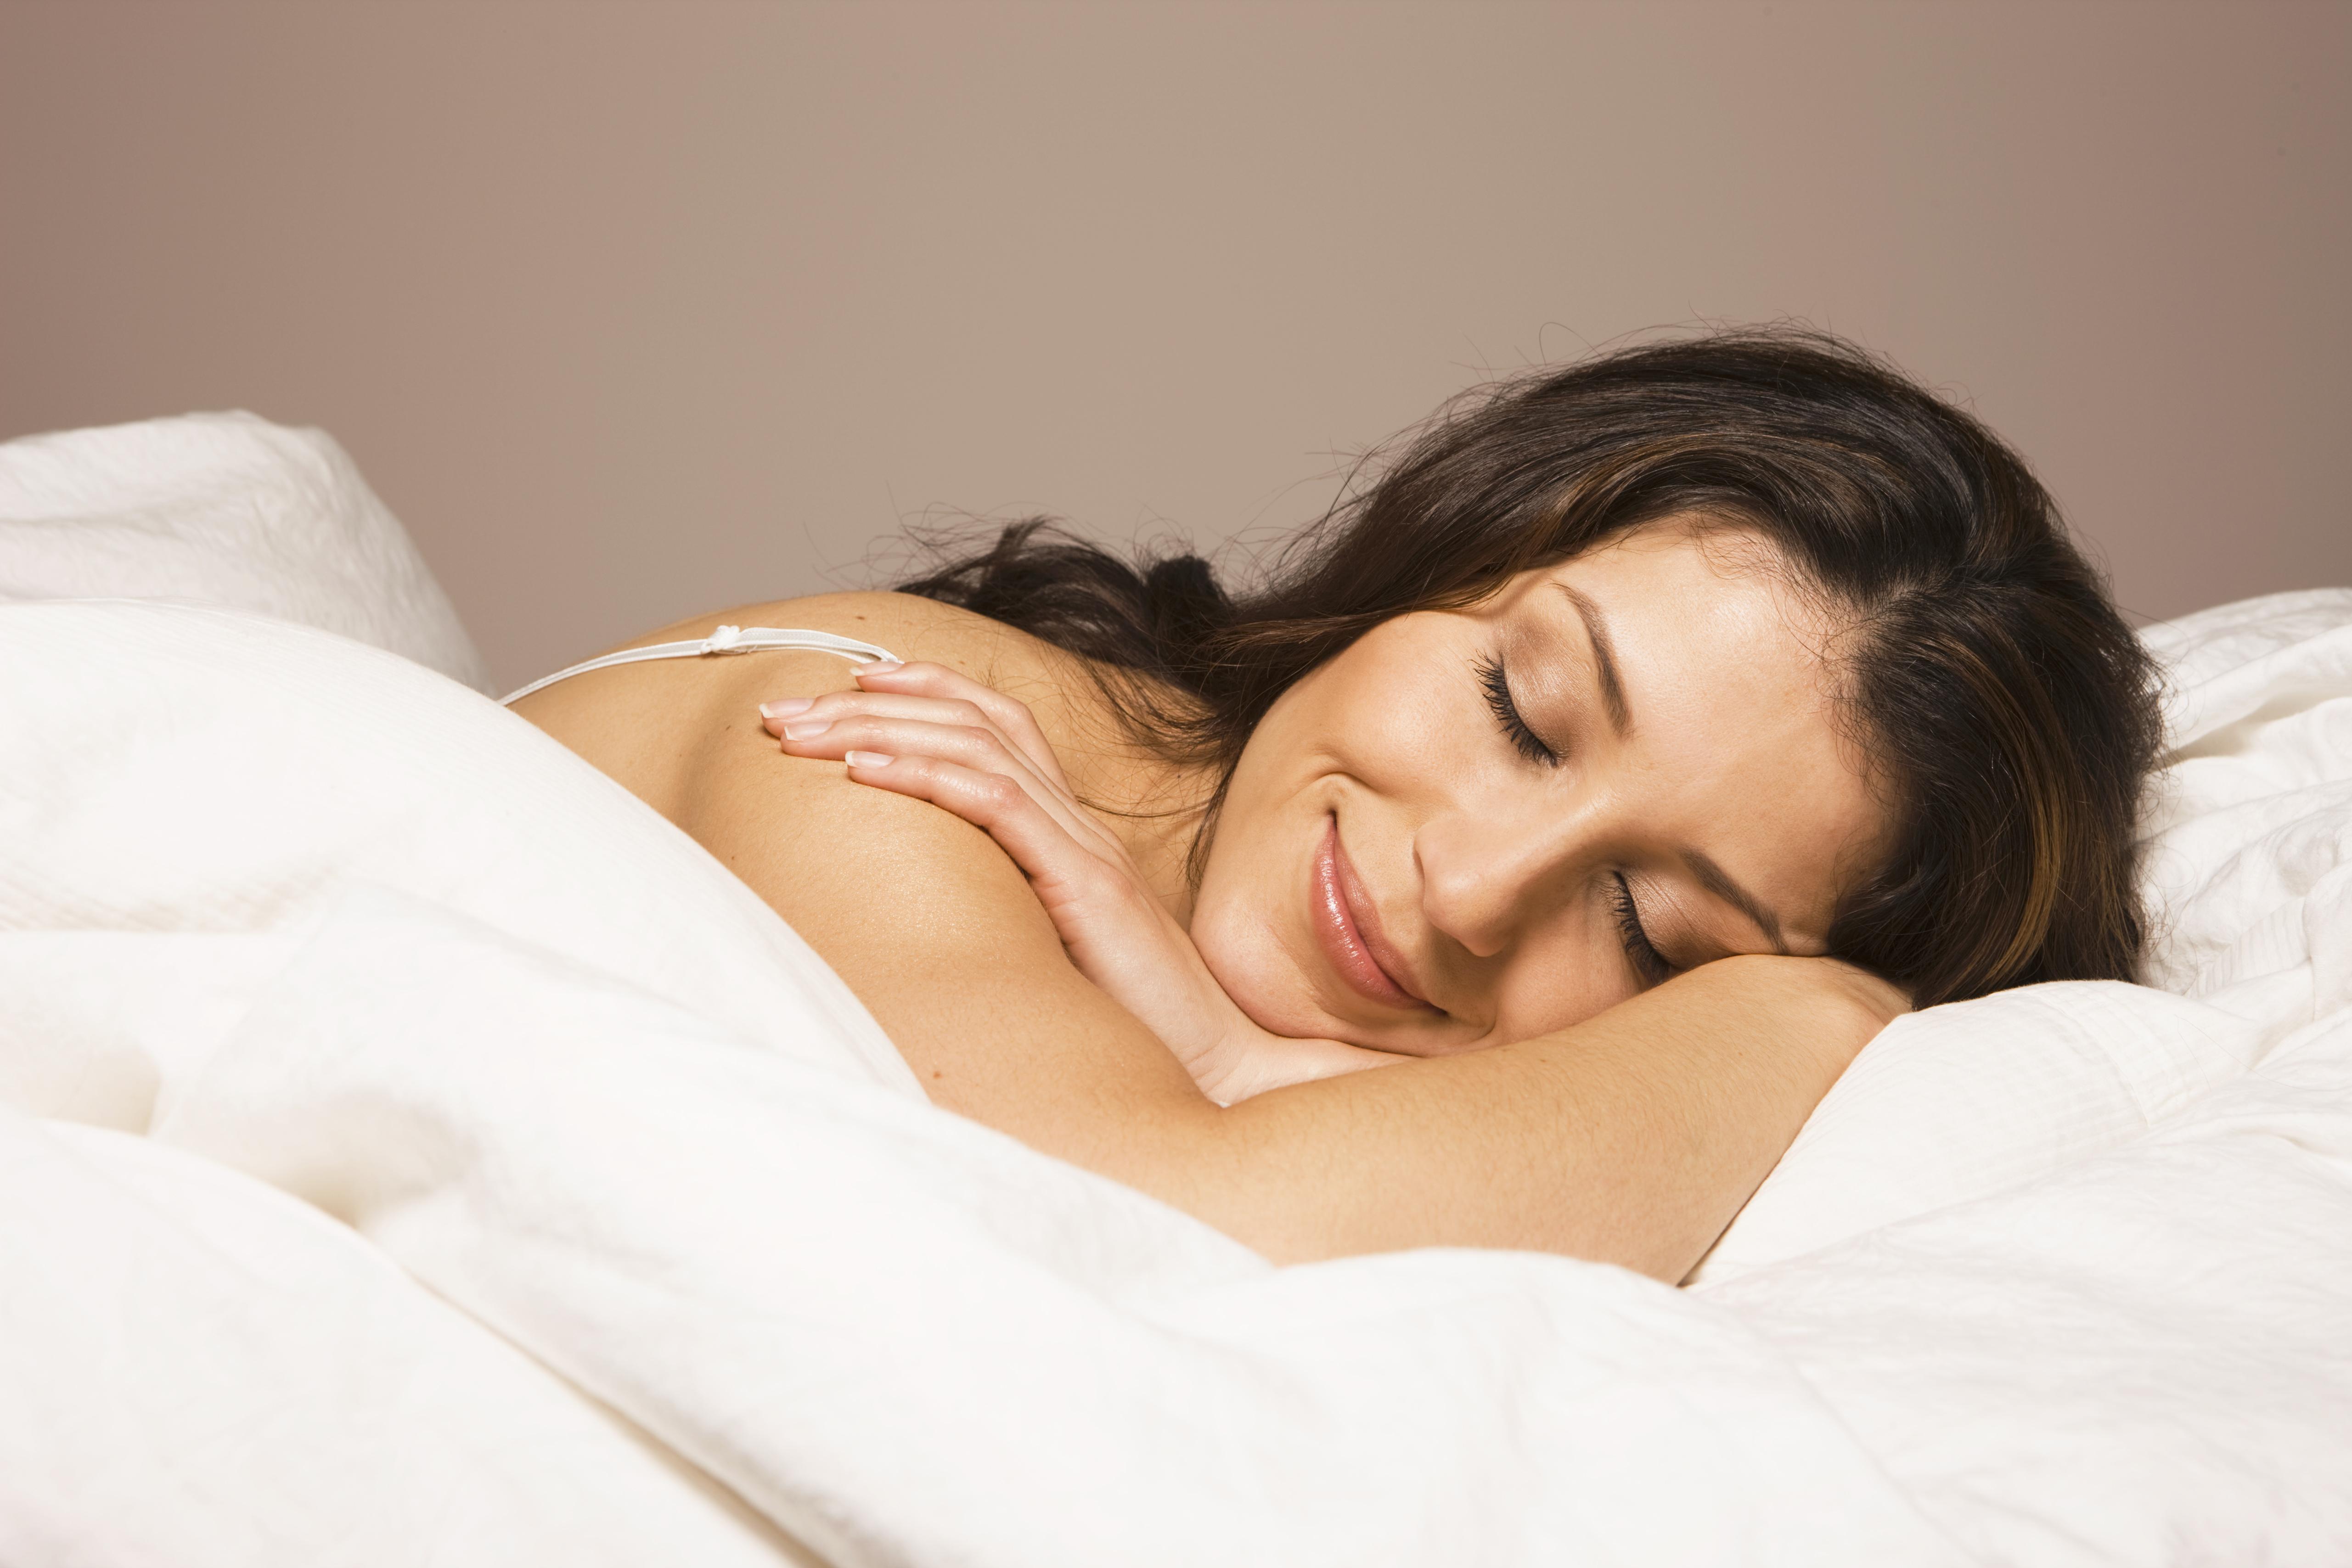 hispanic woman laying in bed smiling